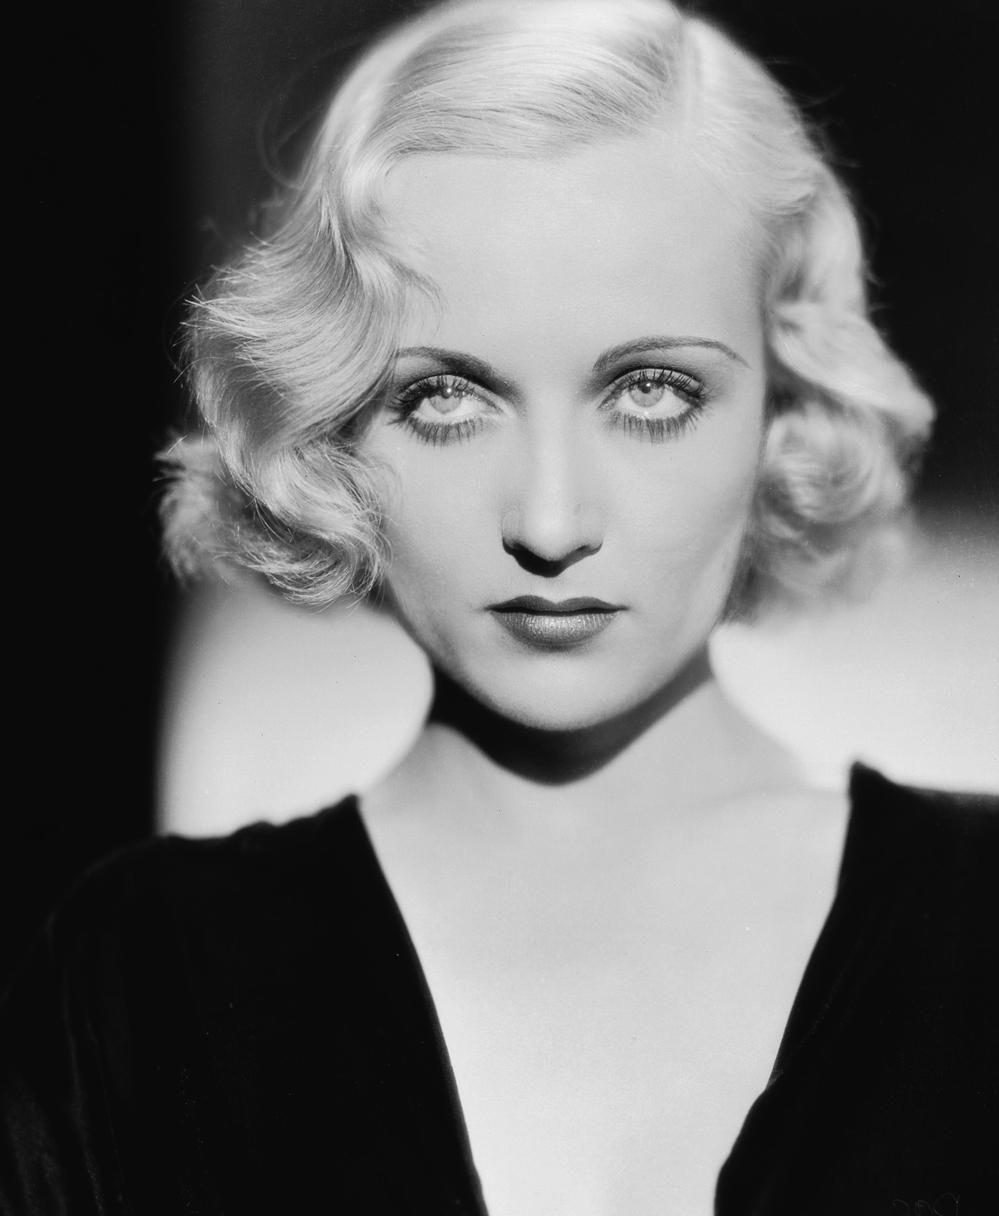 Beautiful Carol Lombard. Those eyes ...